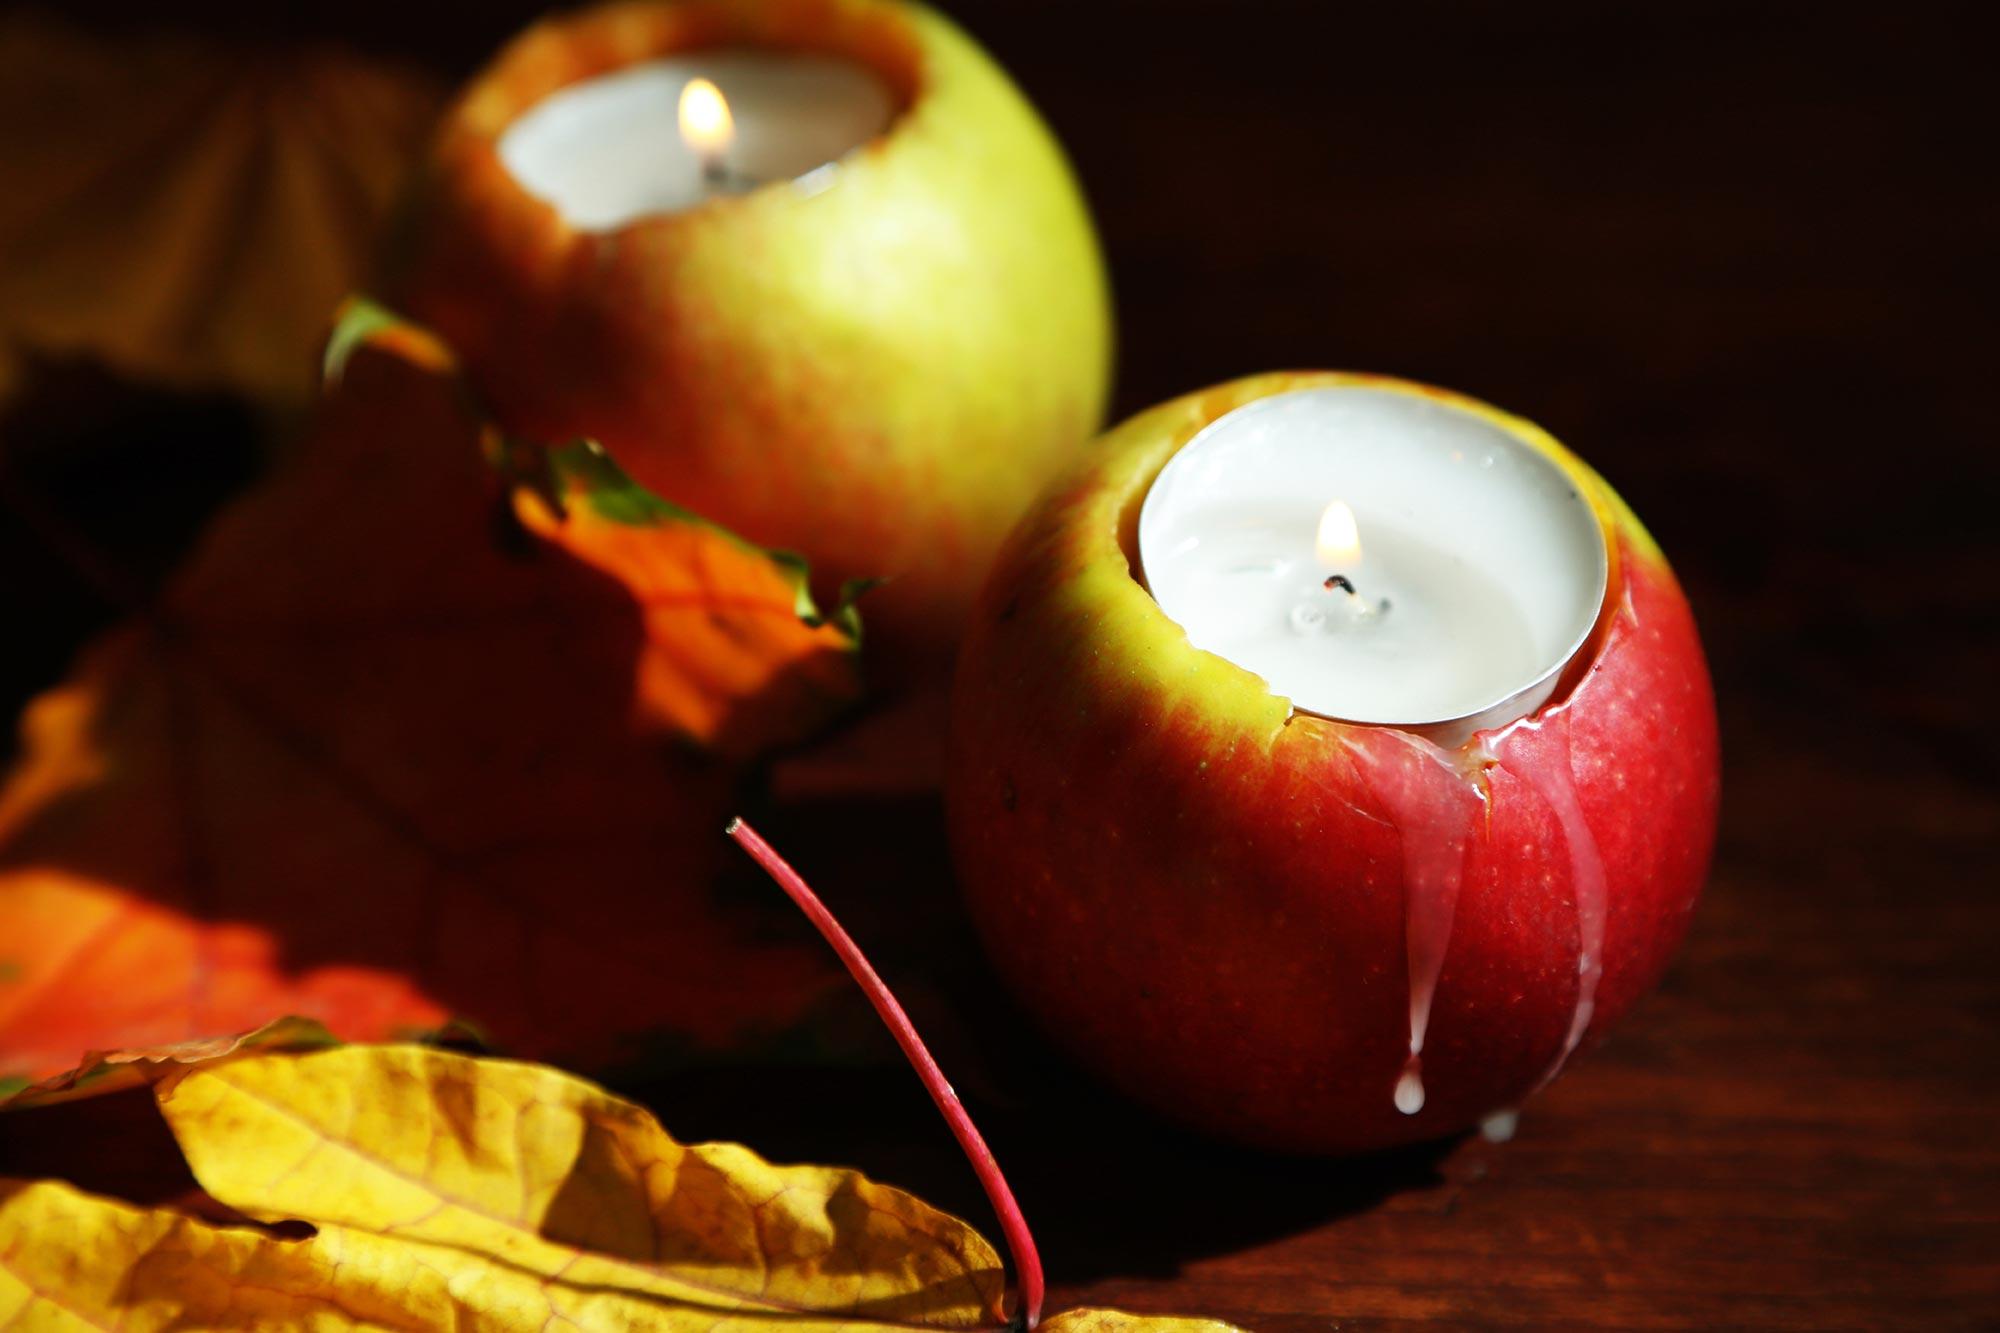 Apfel-Teelichthalter Herbst-Dekoration